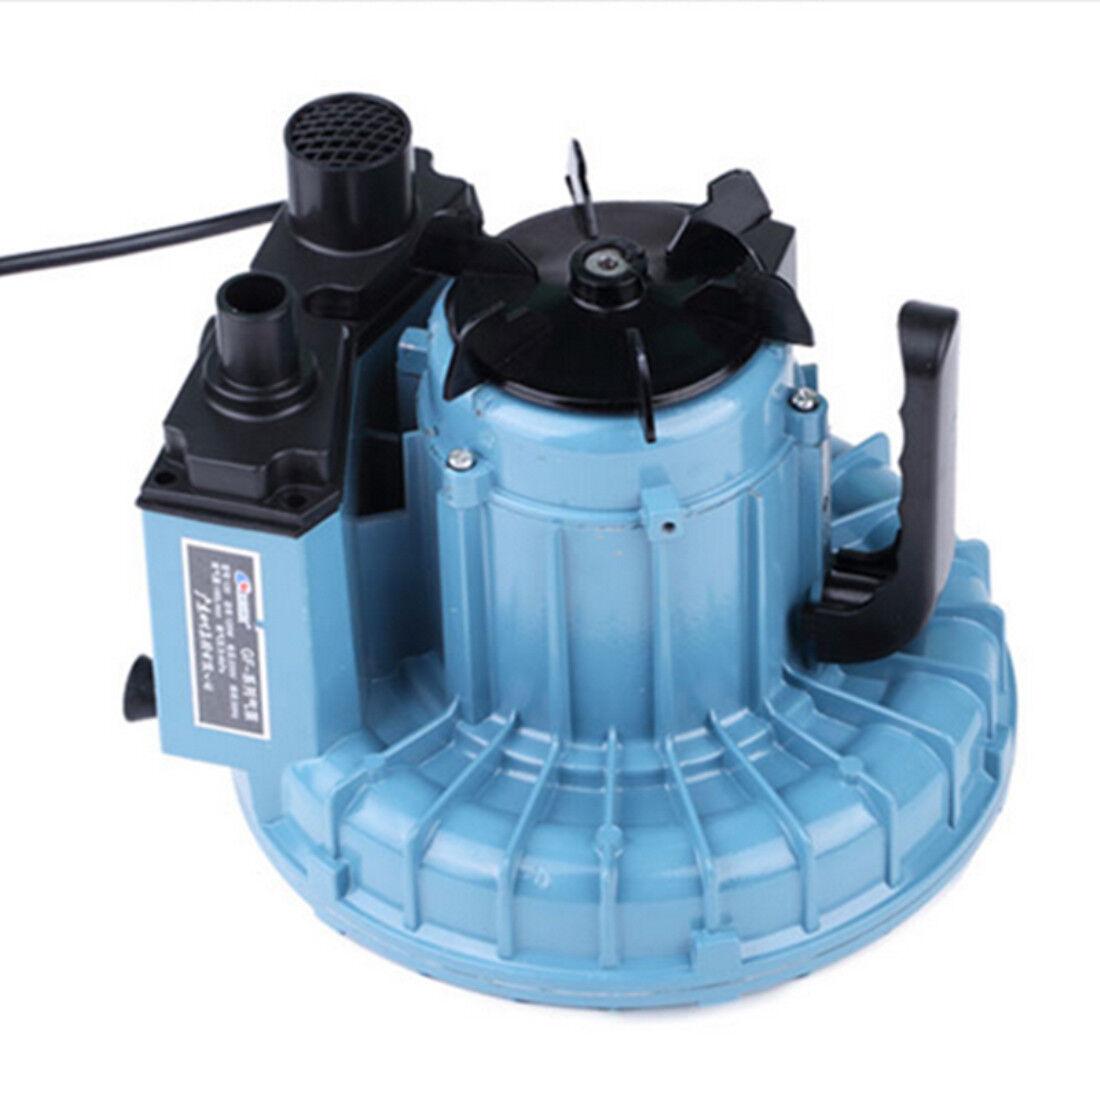 Resun Blower Air Pump, GF-120 Water Pumps Feature For Fish Tanks Aquariums Ponds